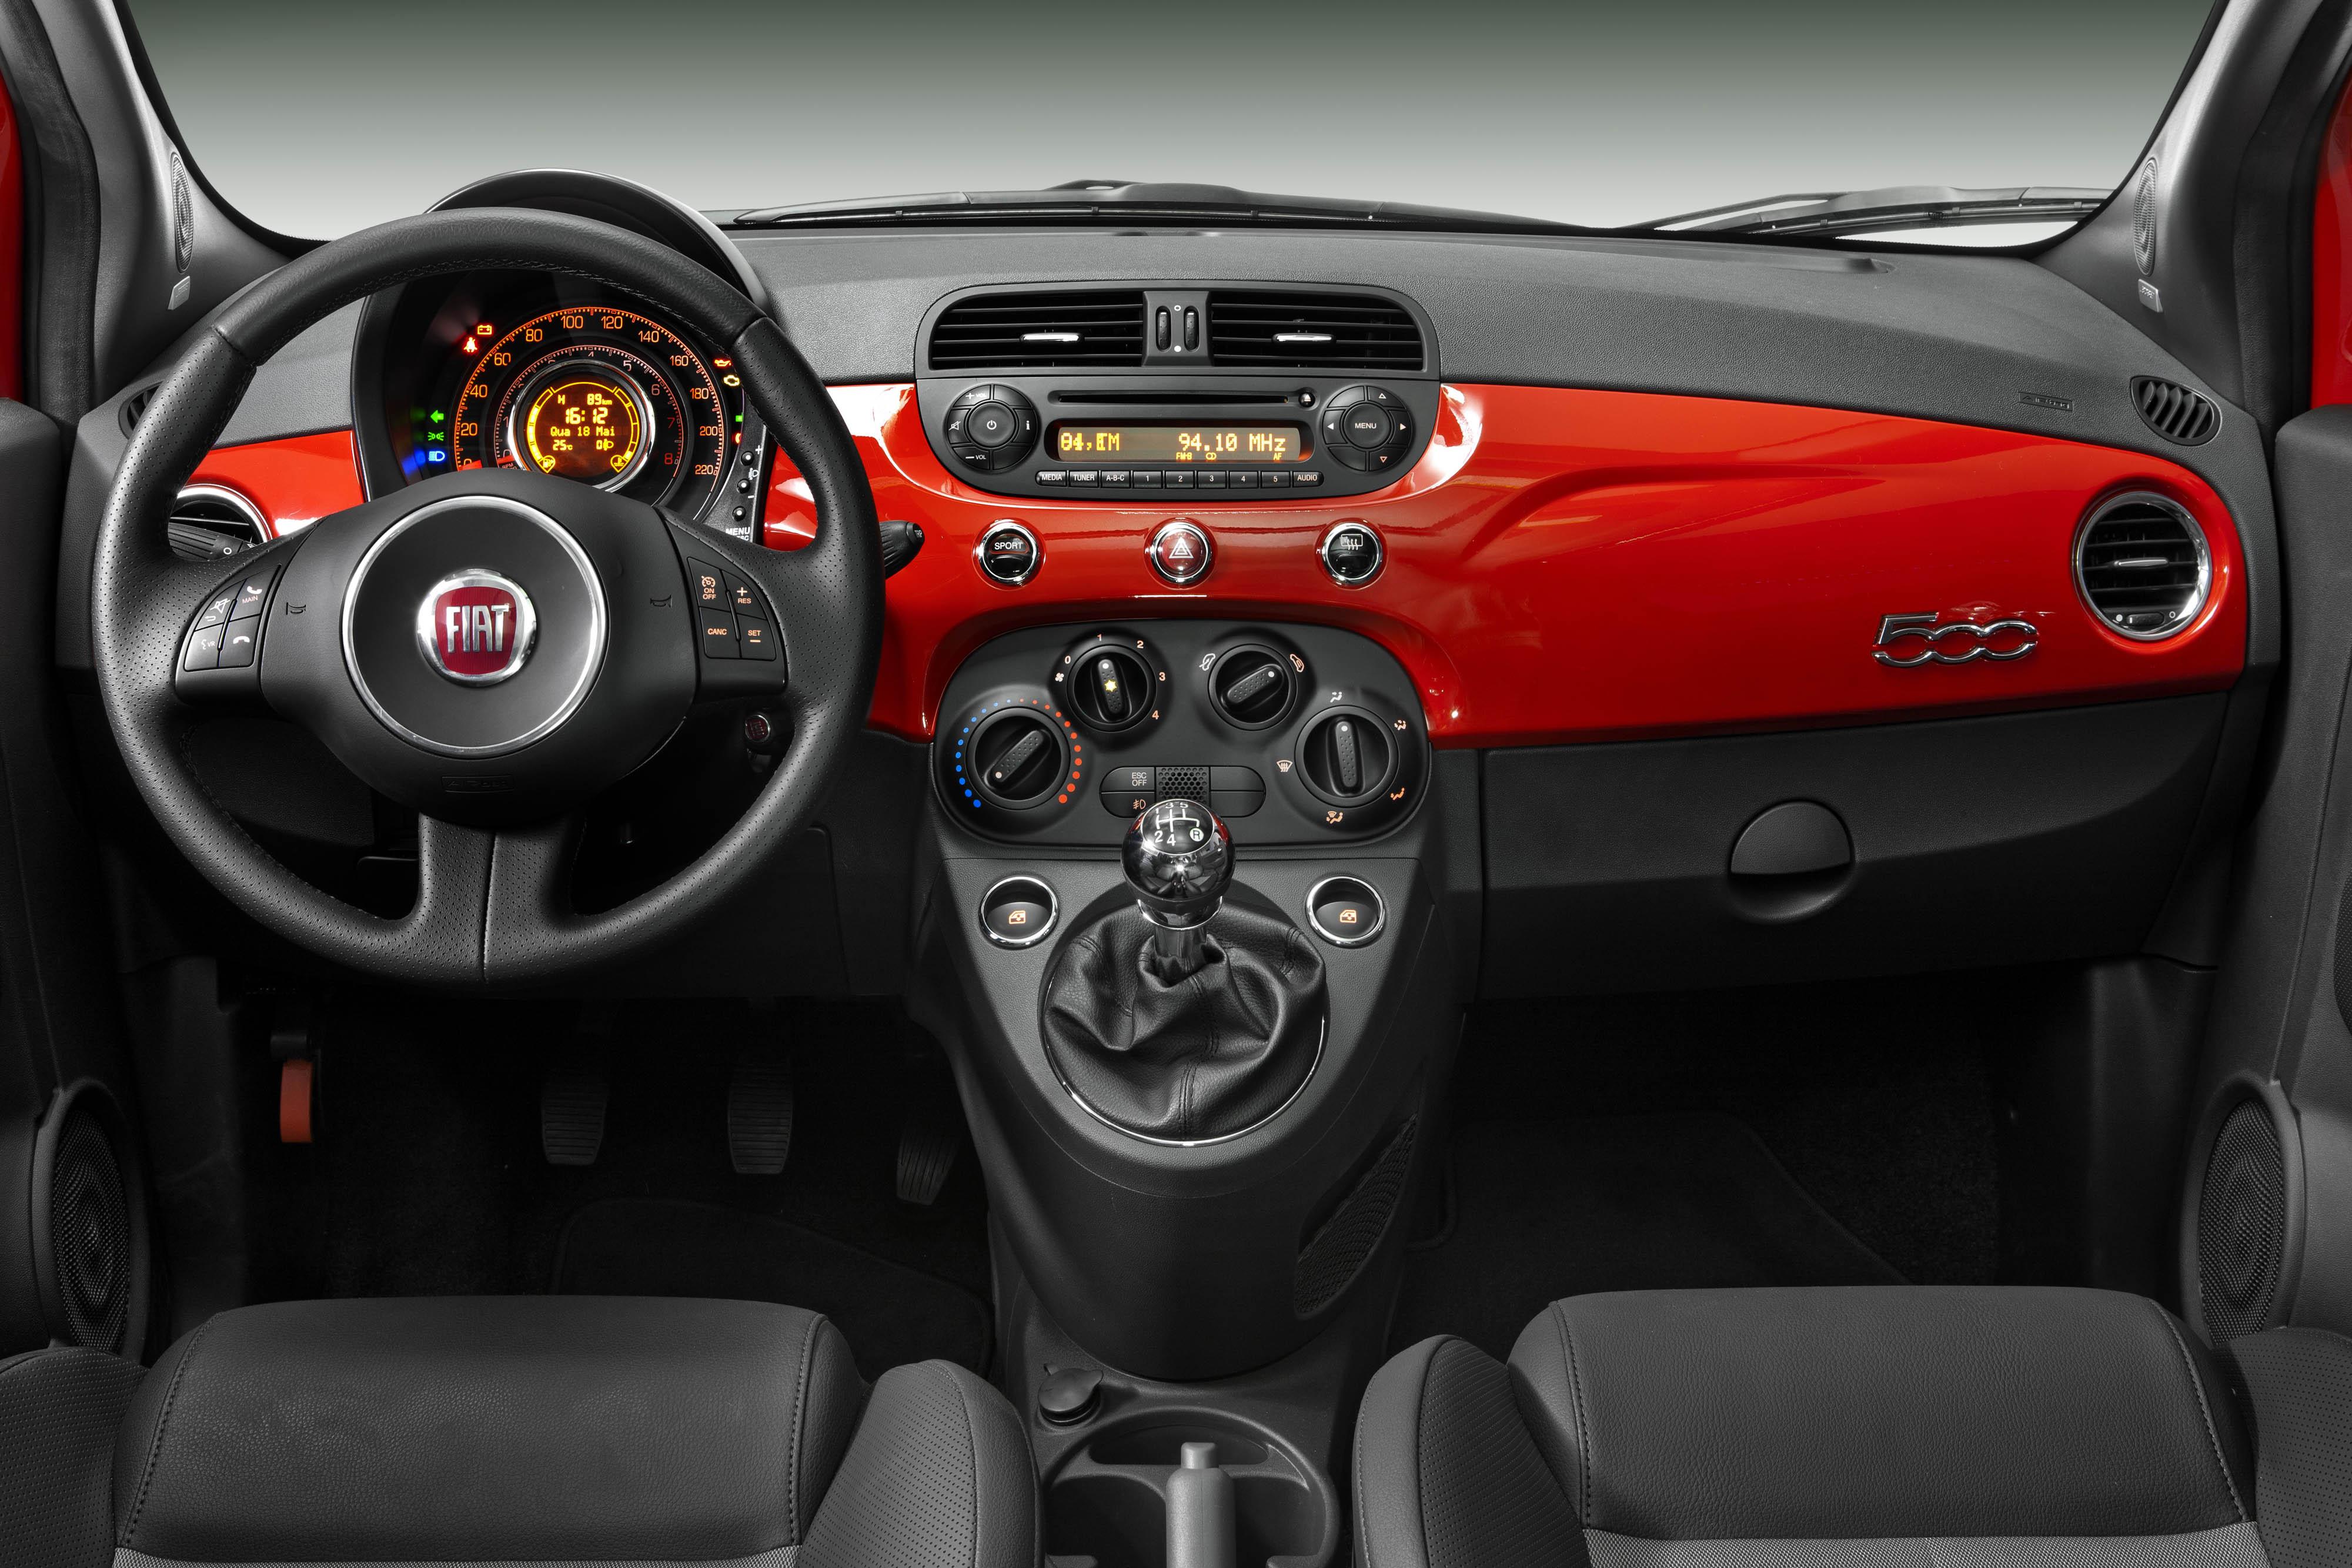 Goede Fiat 500 Sport Air 1.4 16v 2011 (Interior) | SB-67